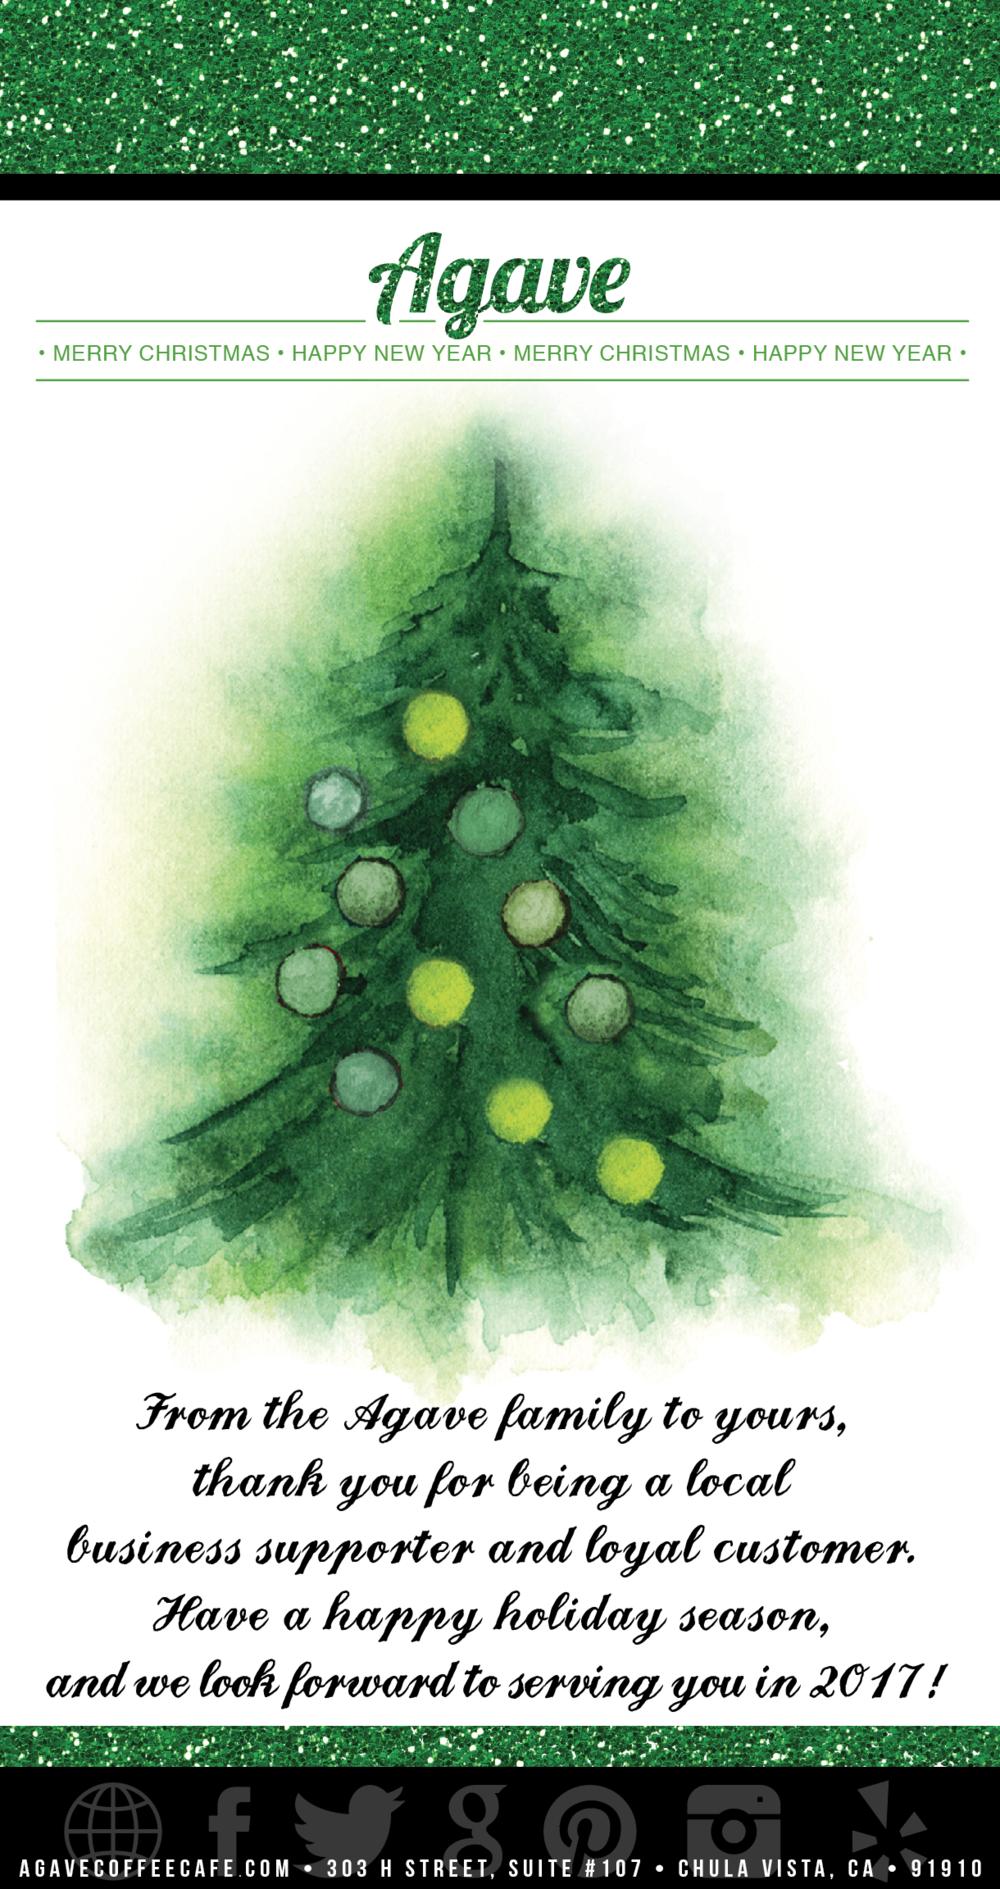 Agave_Merry_Christmas.jpb